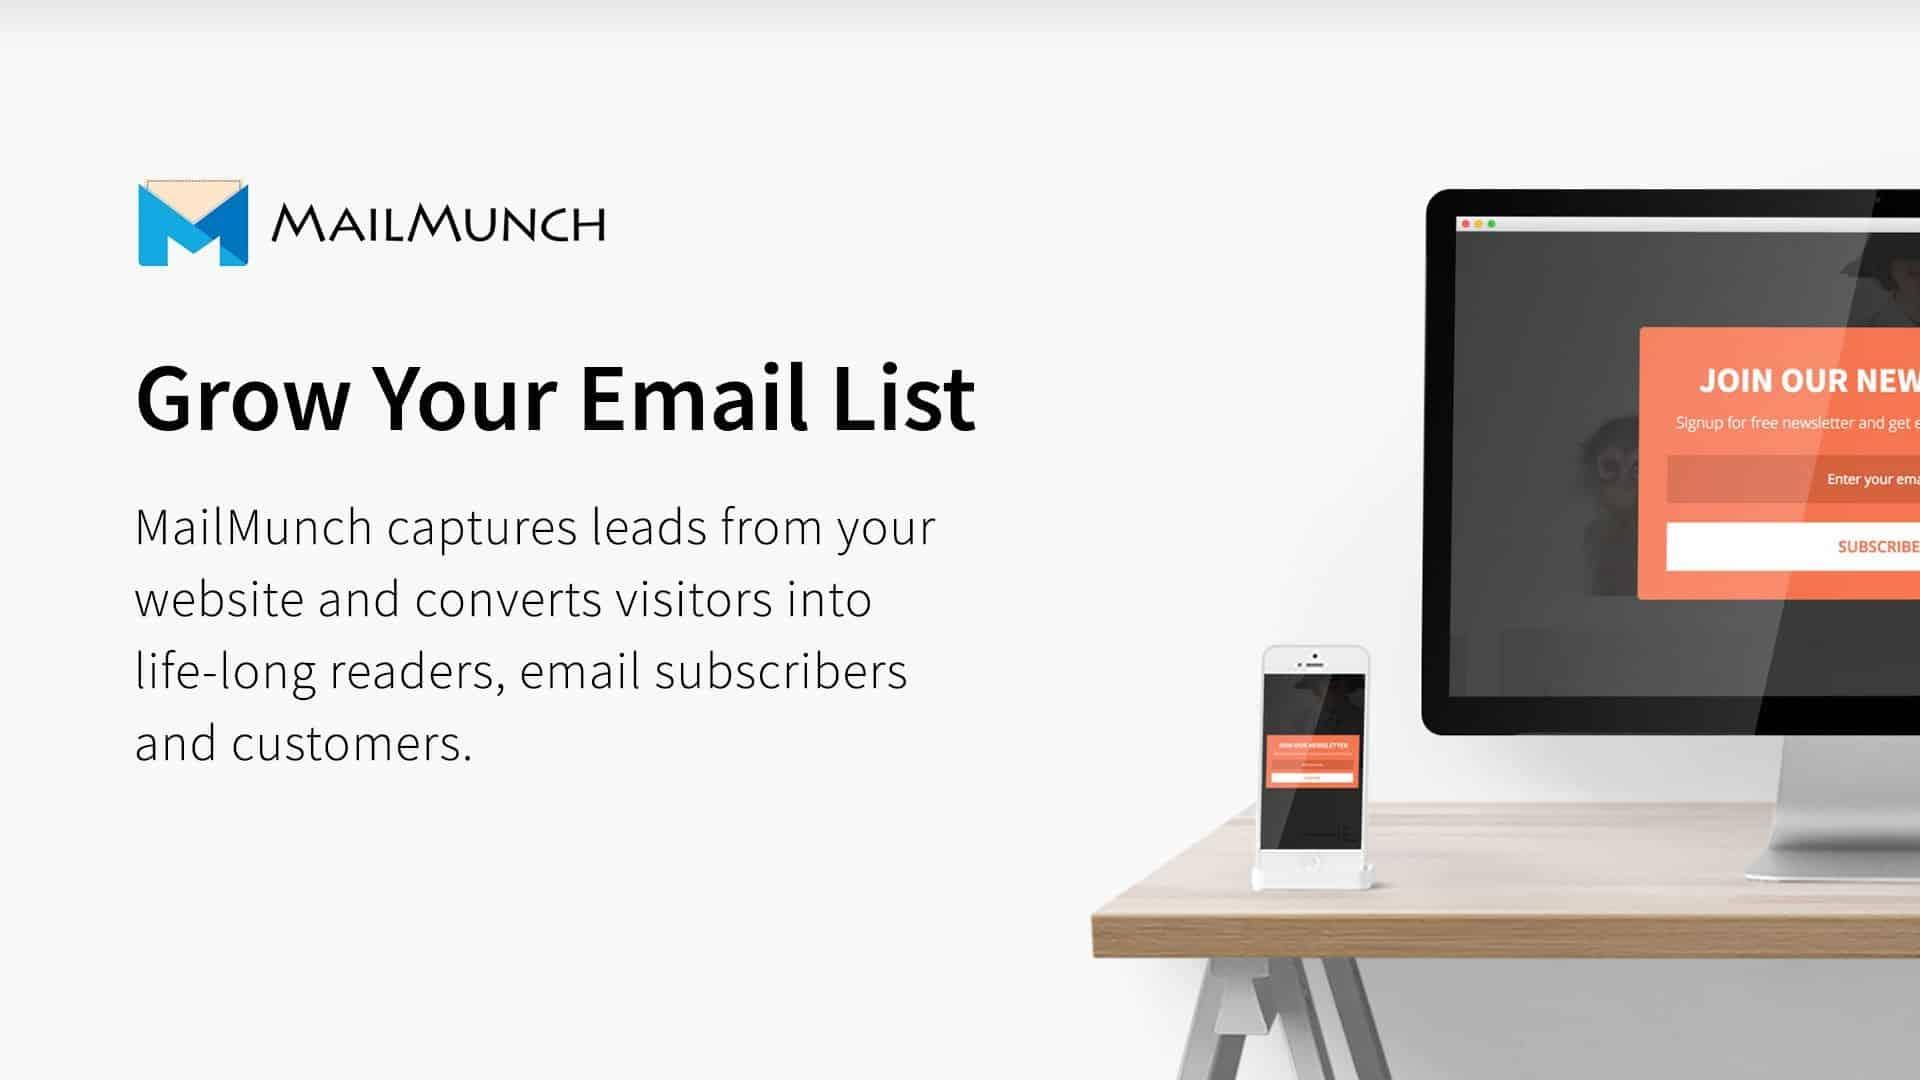 MailMunch